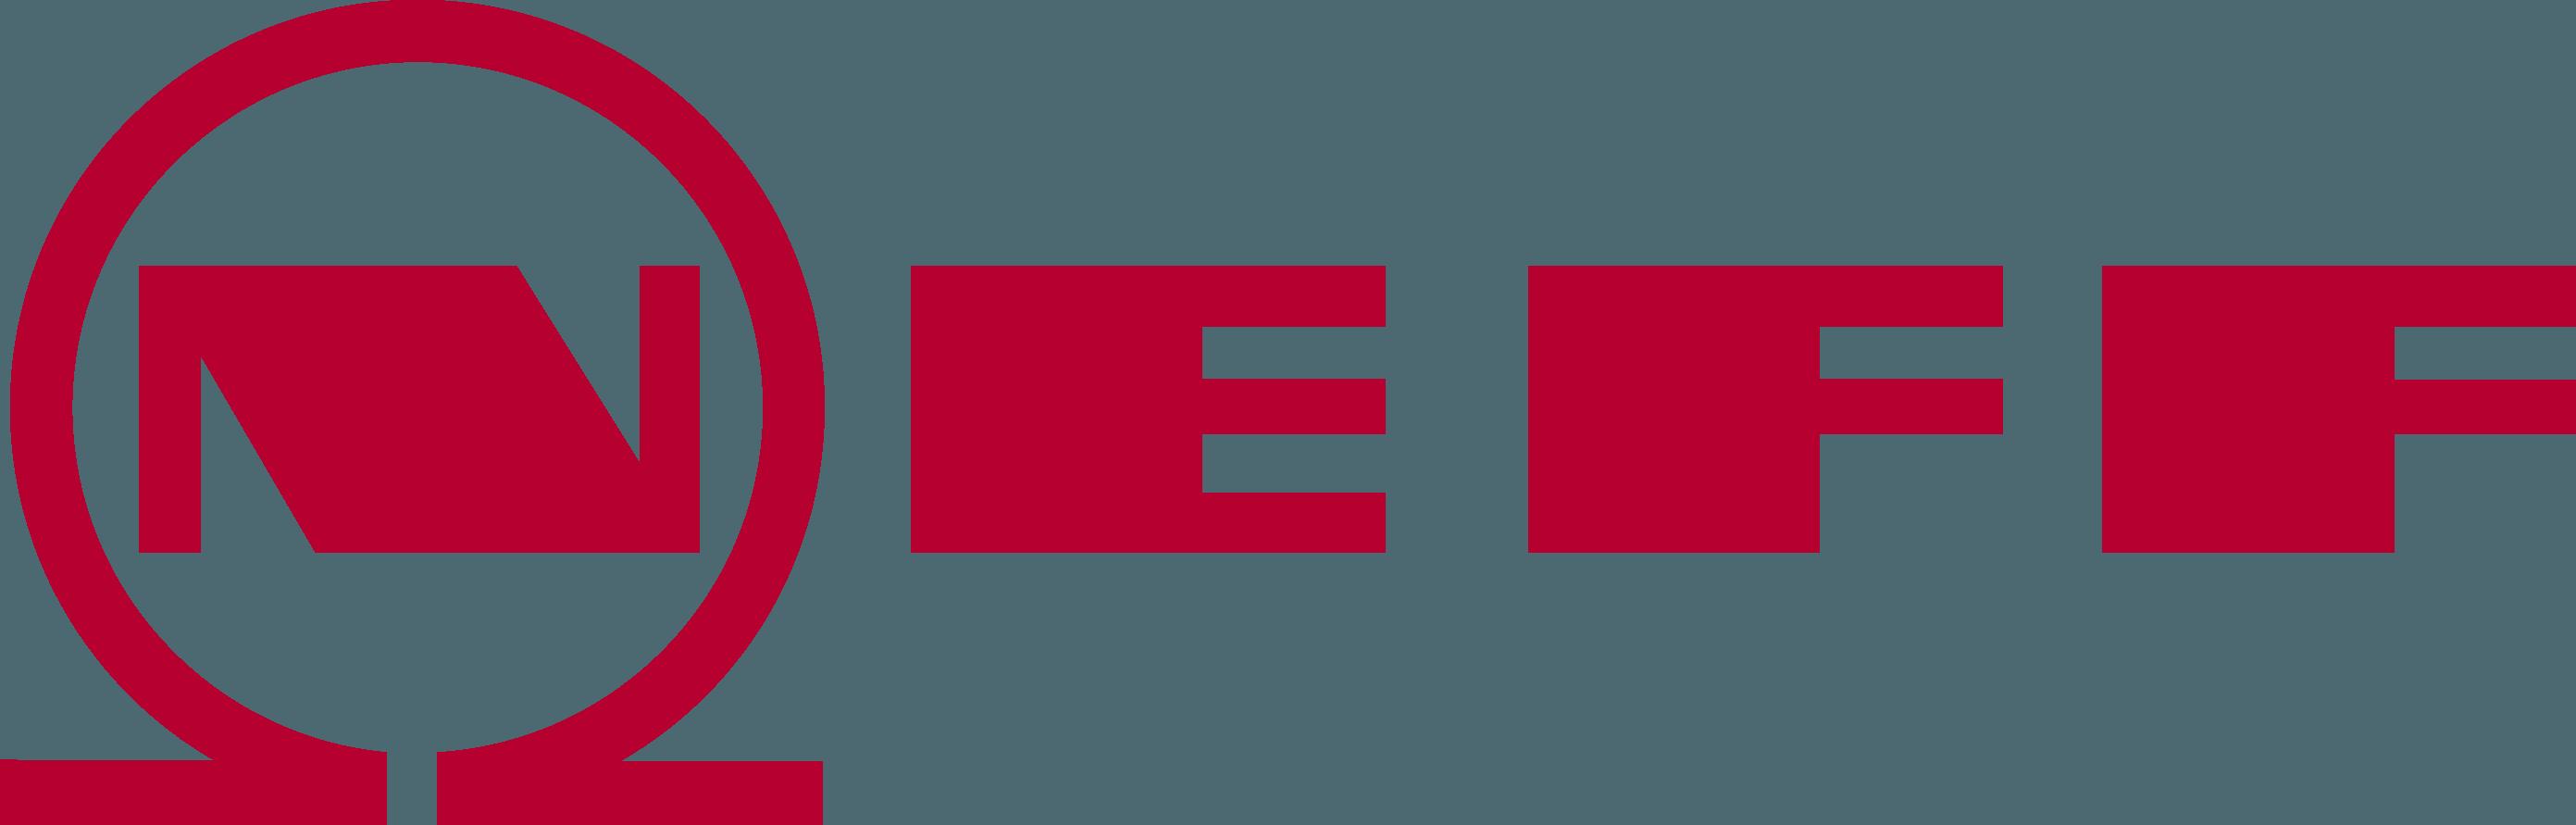 Neff Logo png